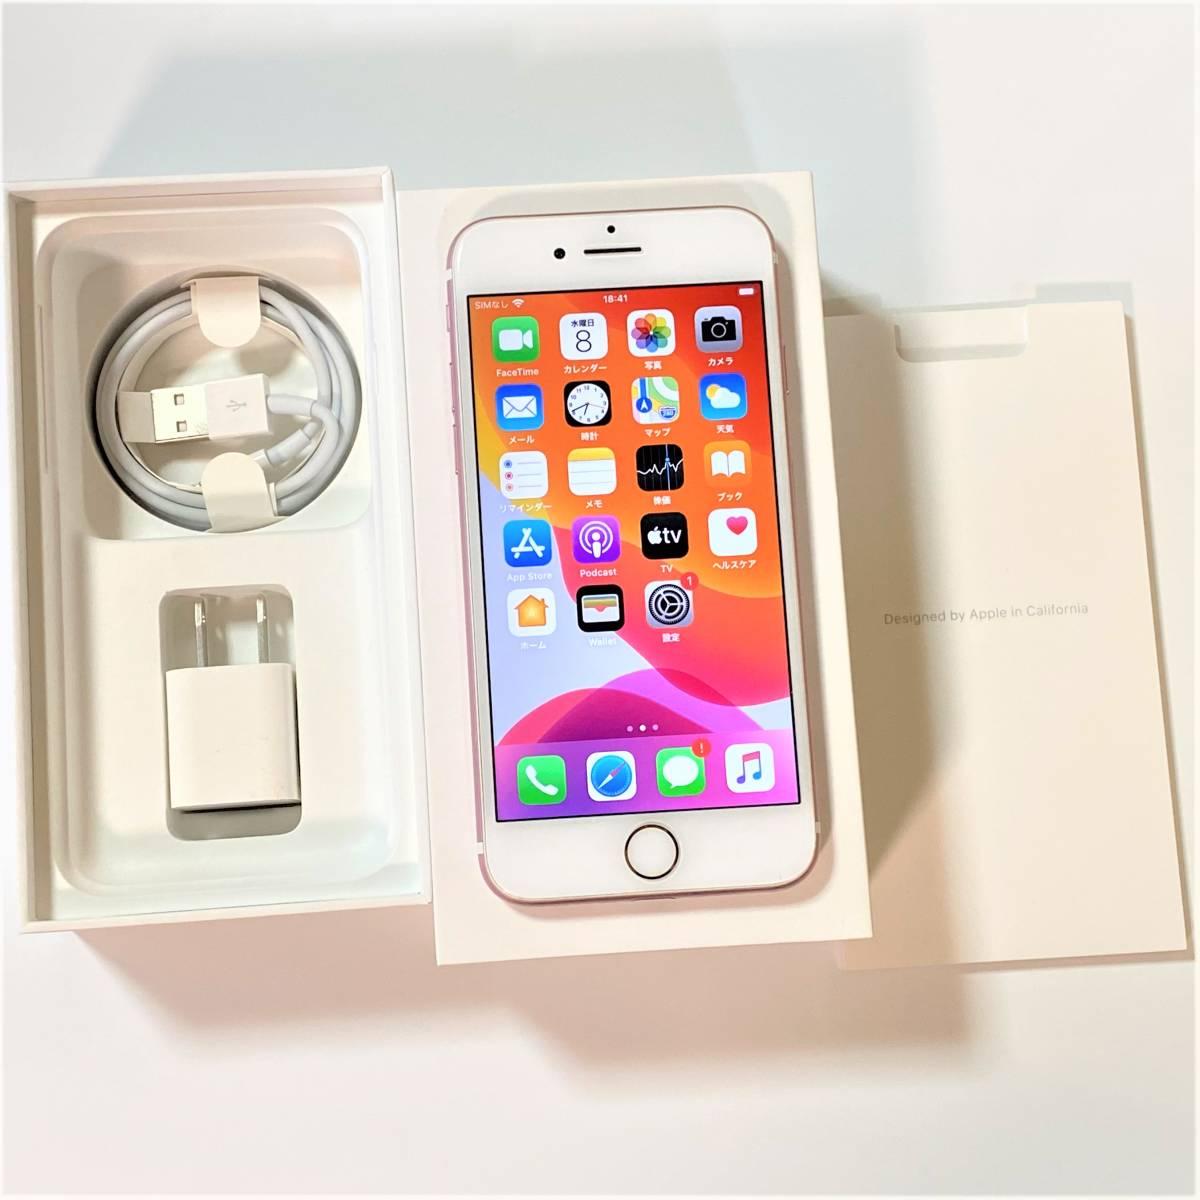 SIMフリー iPhone 7 ローズゴールド 128GB MNCN2J/A iOS13.5.1 docomo 格安SIM MVNO 海外利用可能 アクティベーションロック解除済